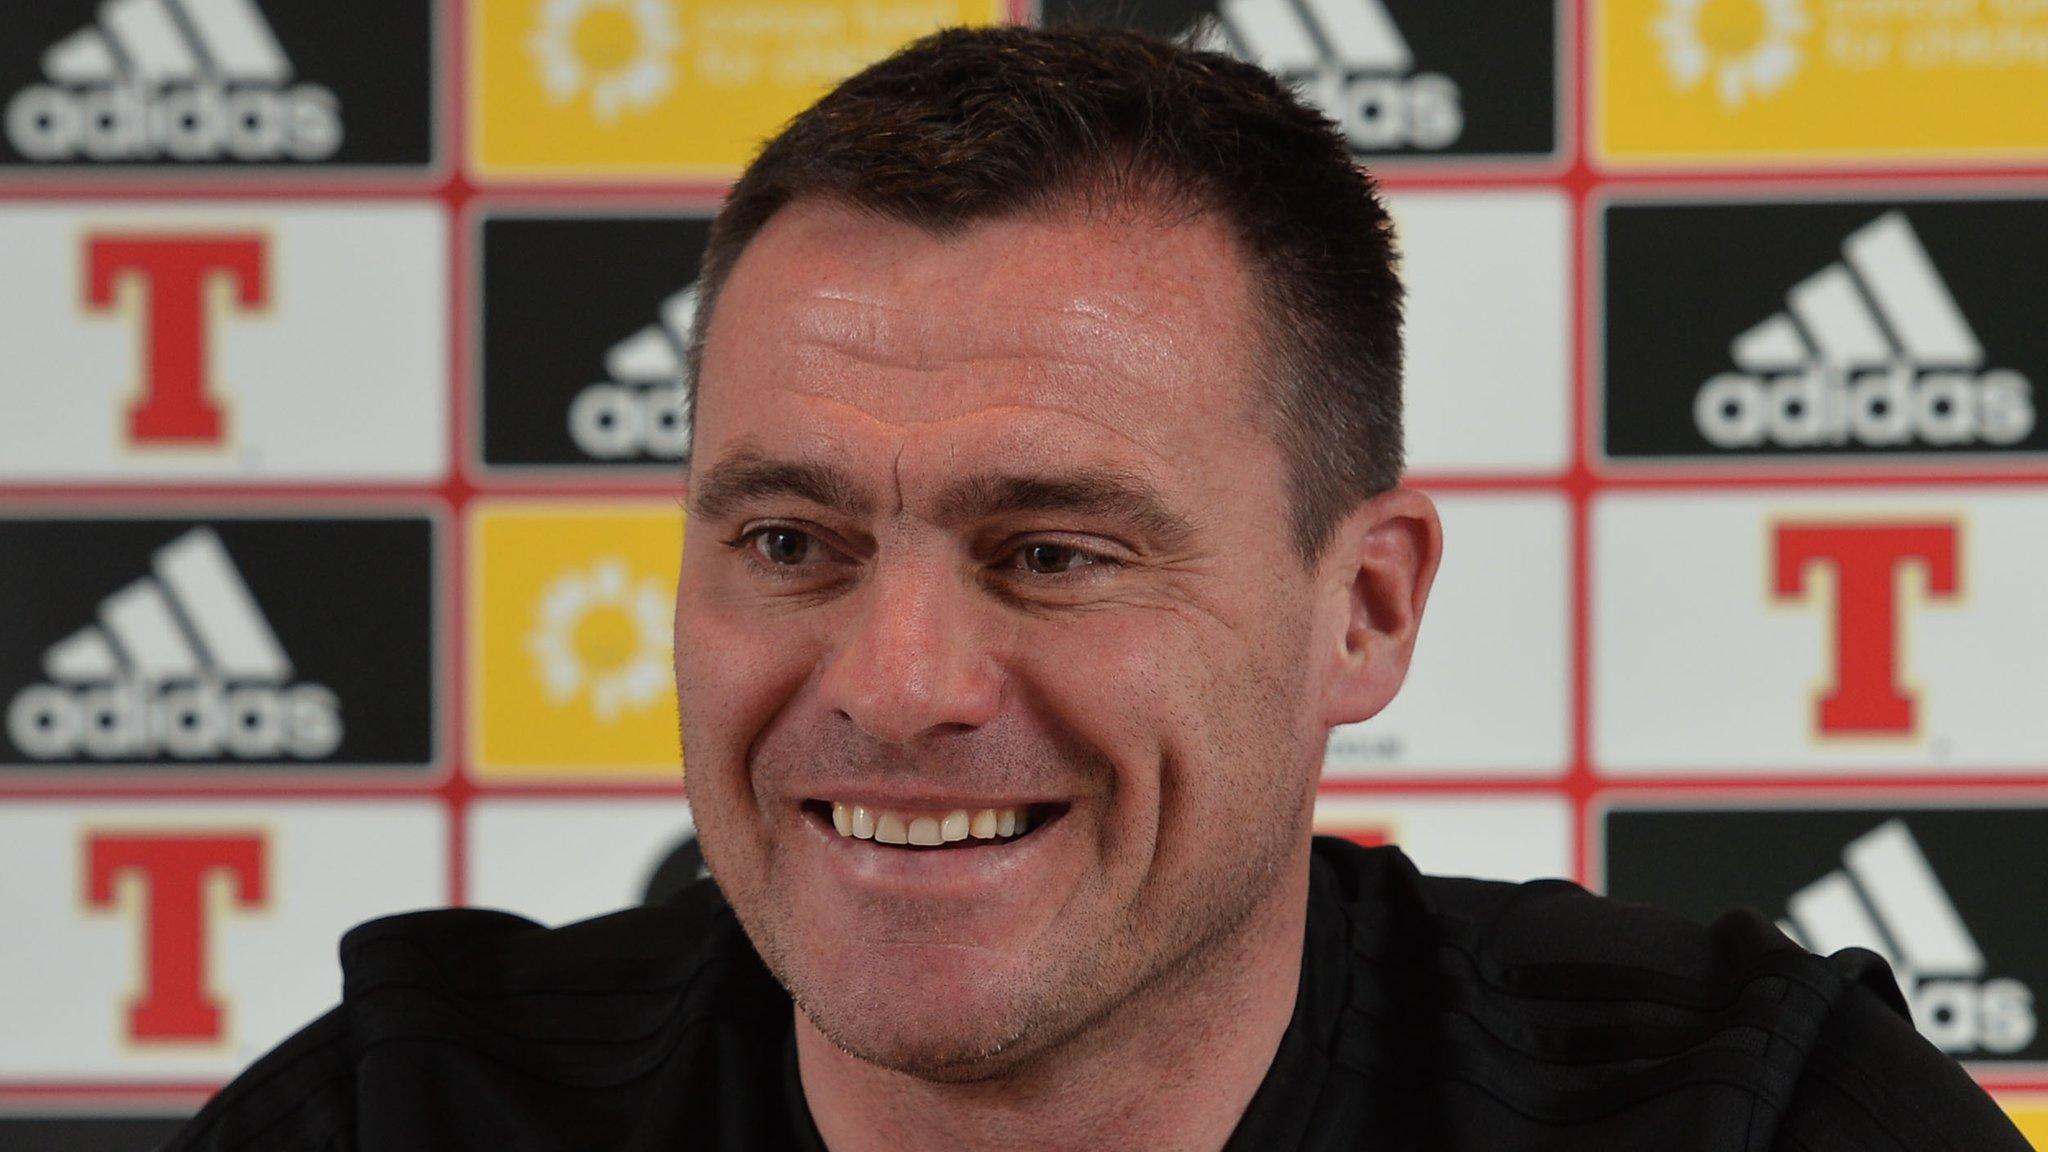 New goalkeeping coach Steve Harper 'really impressed' by NI keepers